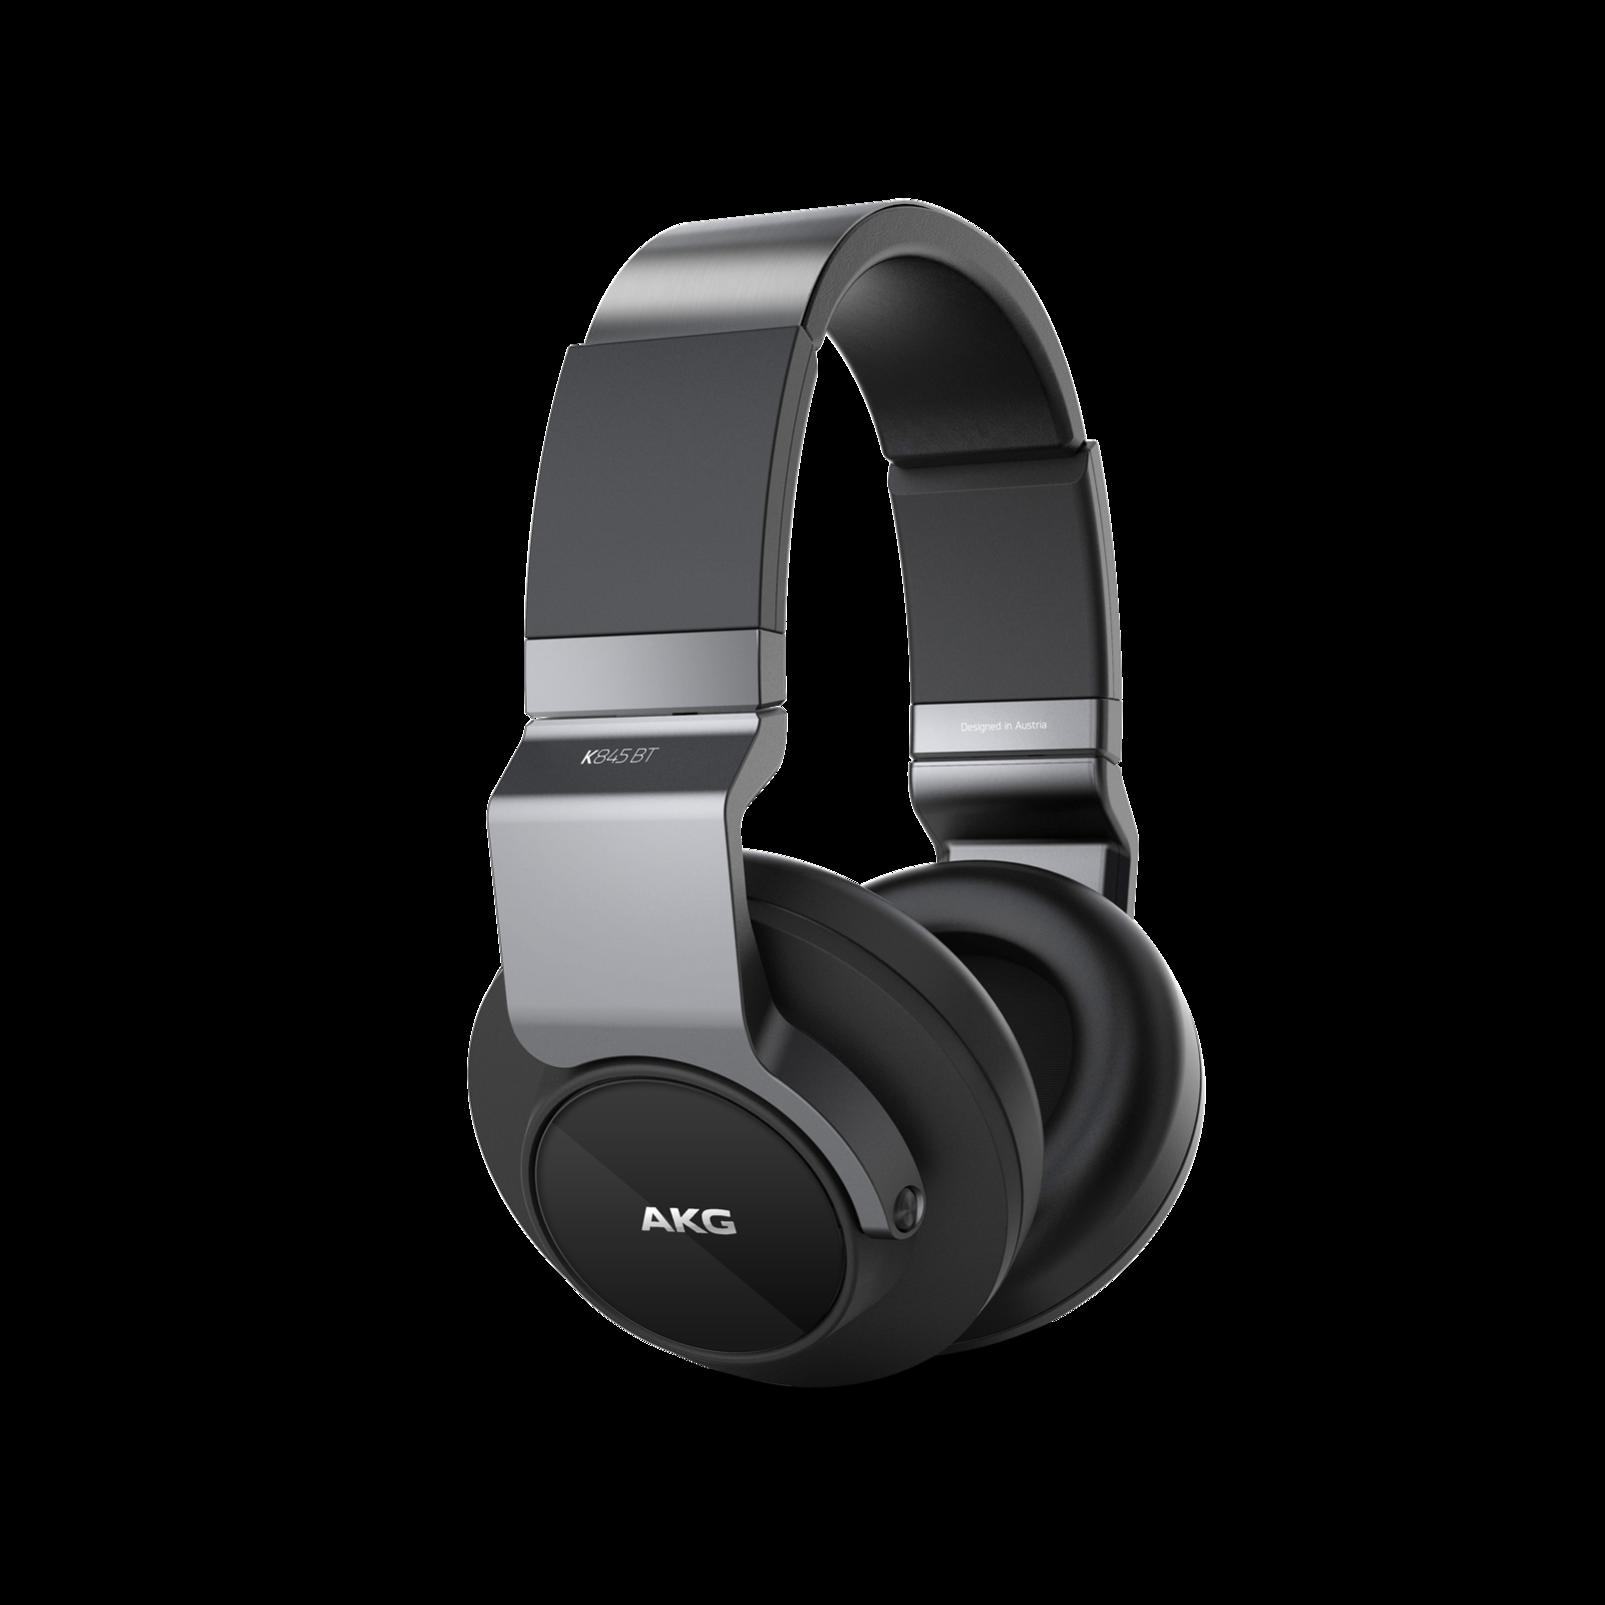 K 845BT - Black - High performance over-ear wireless headphones with Bluetooth - Hero